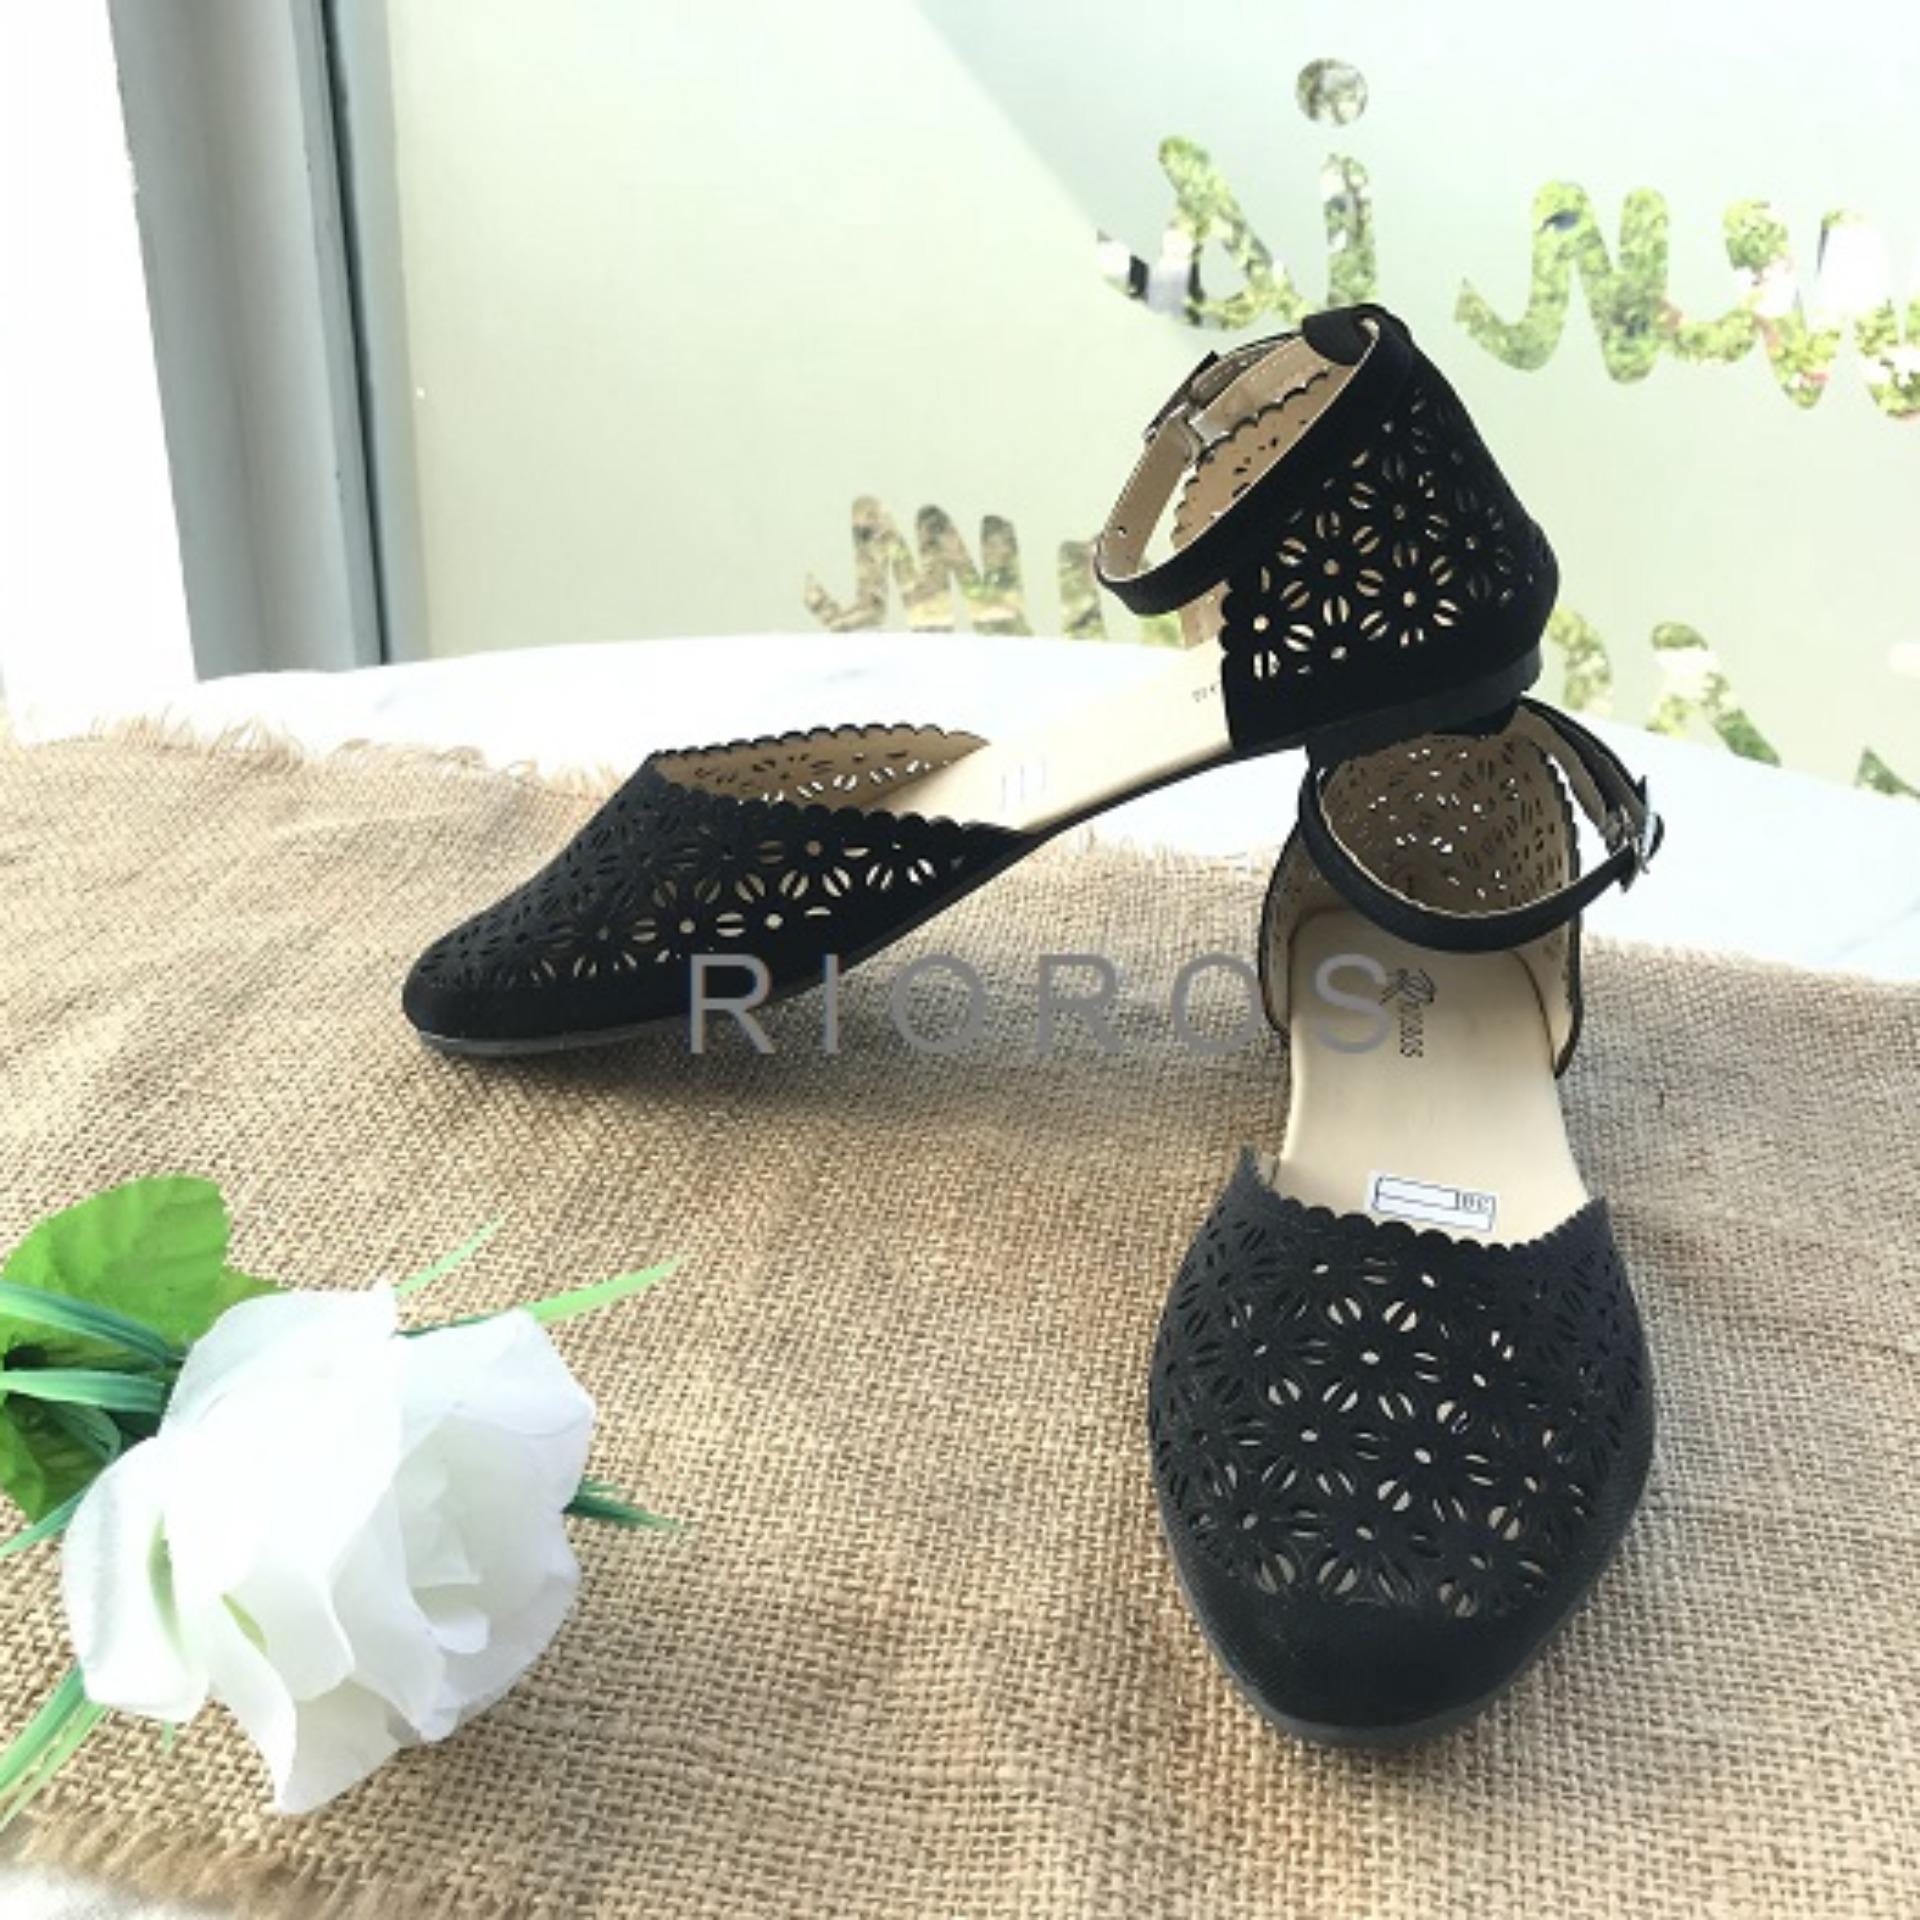 Buy Sell Cheapest Rioros Sepatu Kets Best Quality Product Deals Wanita Flat Shoes Laser Belakang Cream Cut Off Ankle Strap Stella Hitam